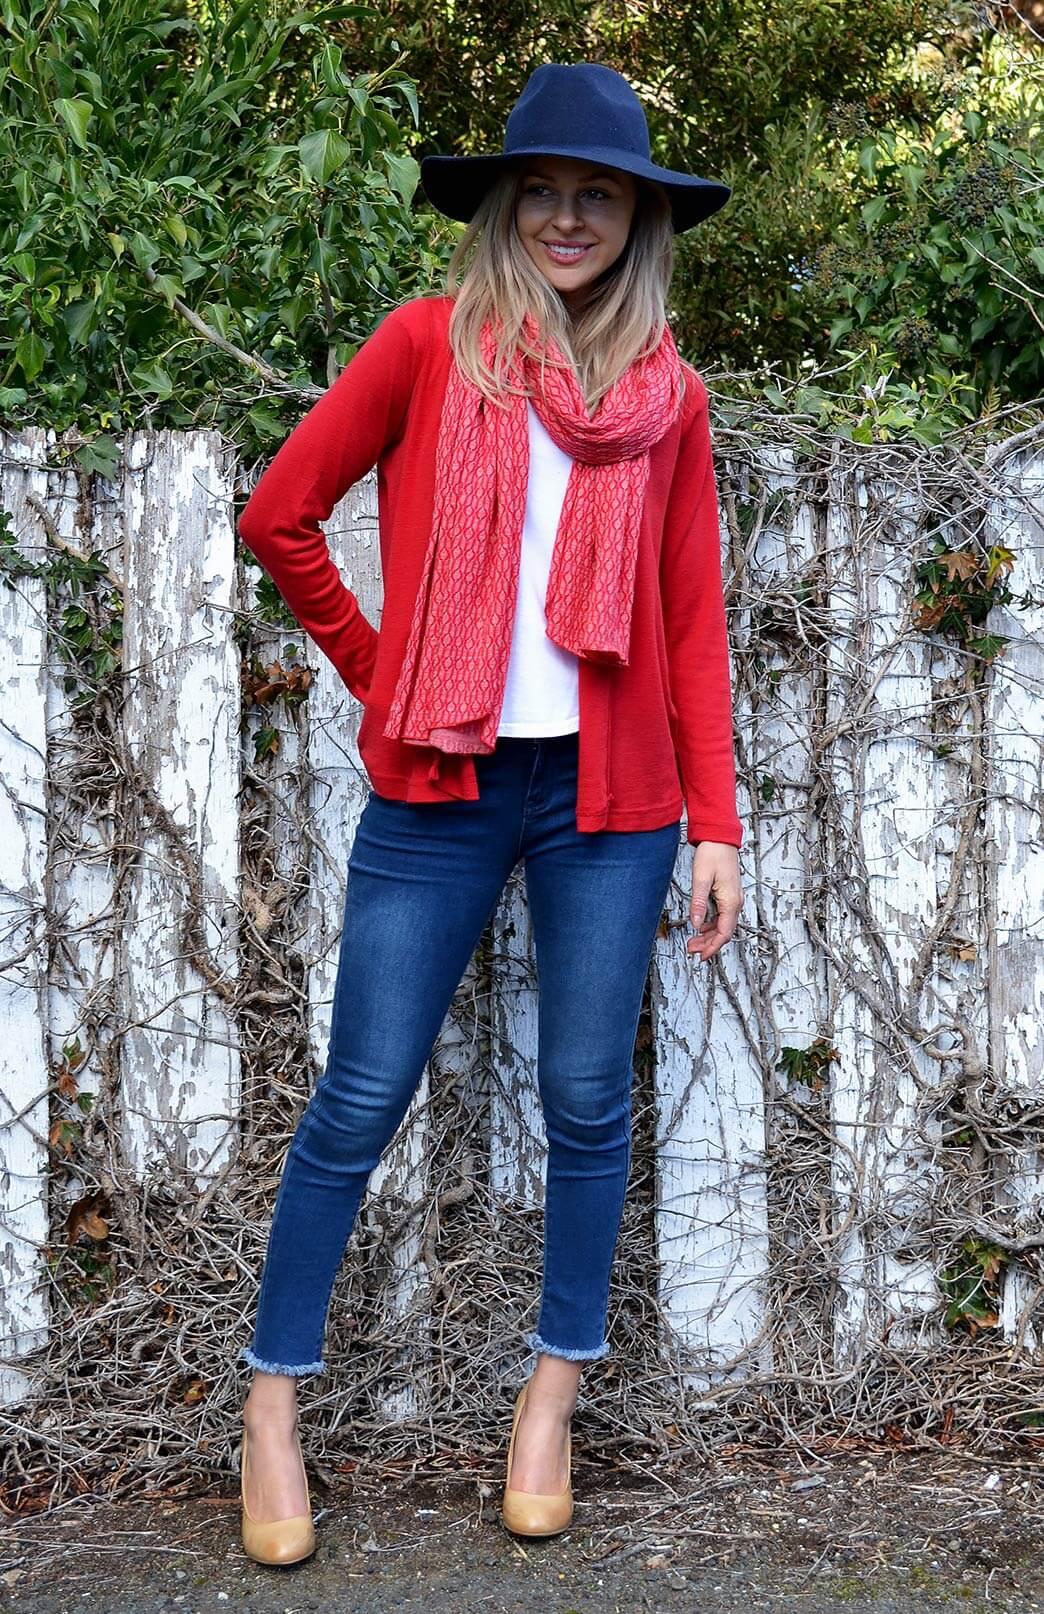 Mini Drape Cardigan - Women's Flame Red Merino Wool Maternity Drape Cardigan - Smitten Merino Tasmania Australia